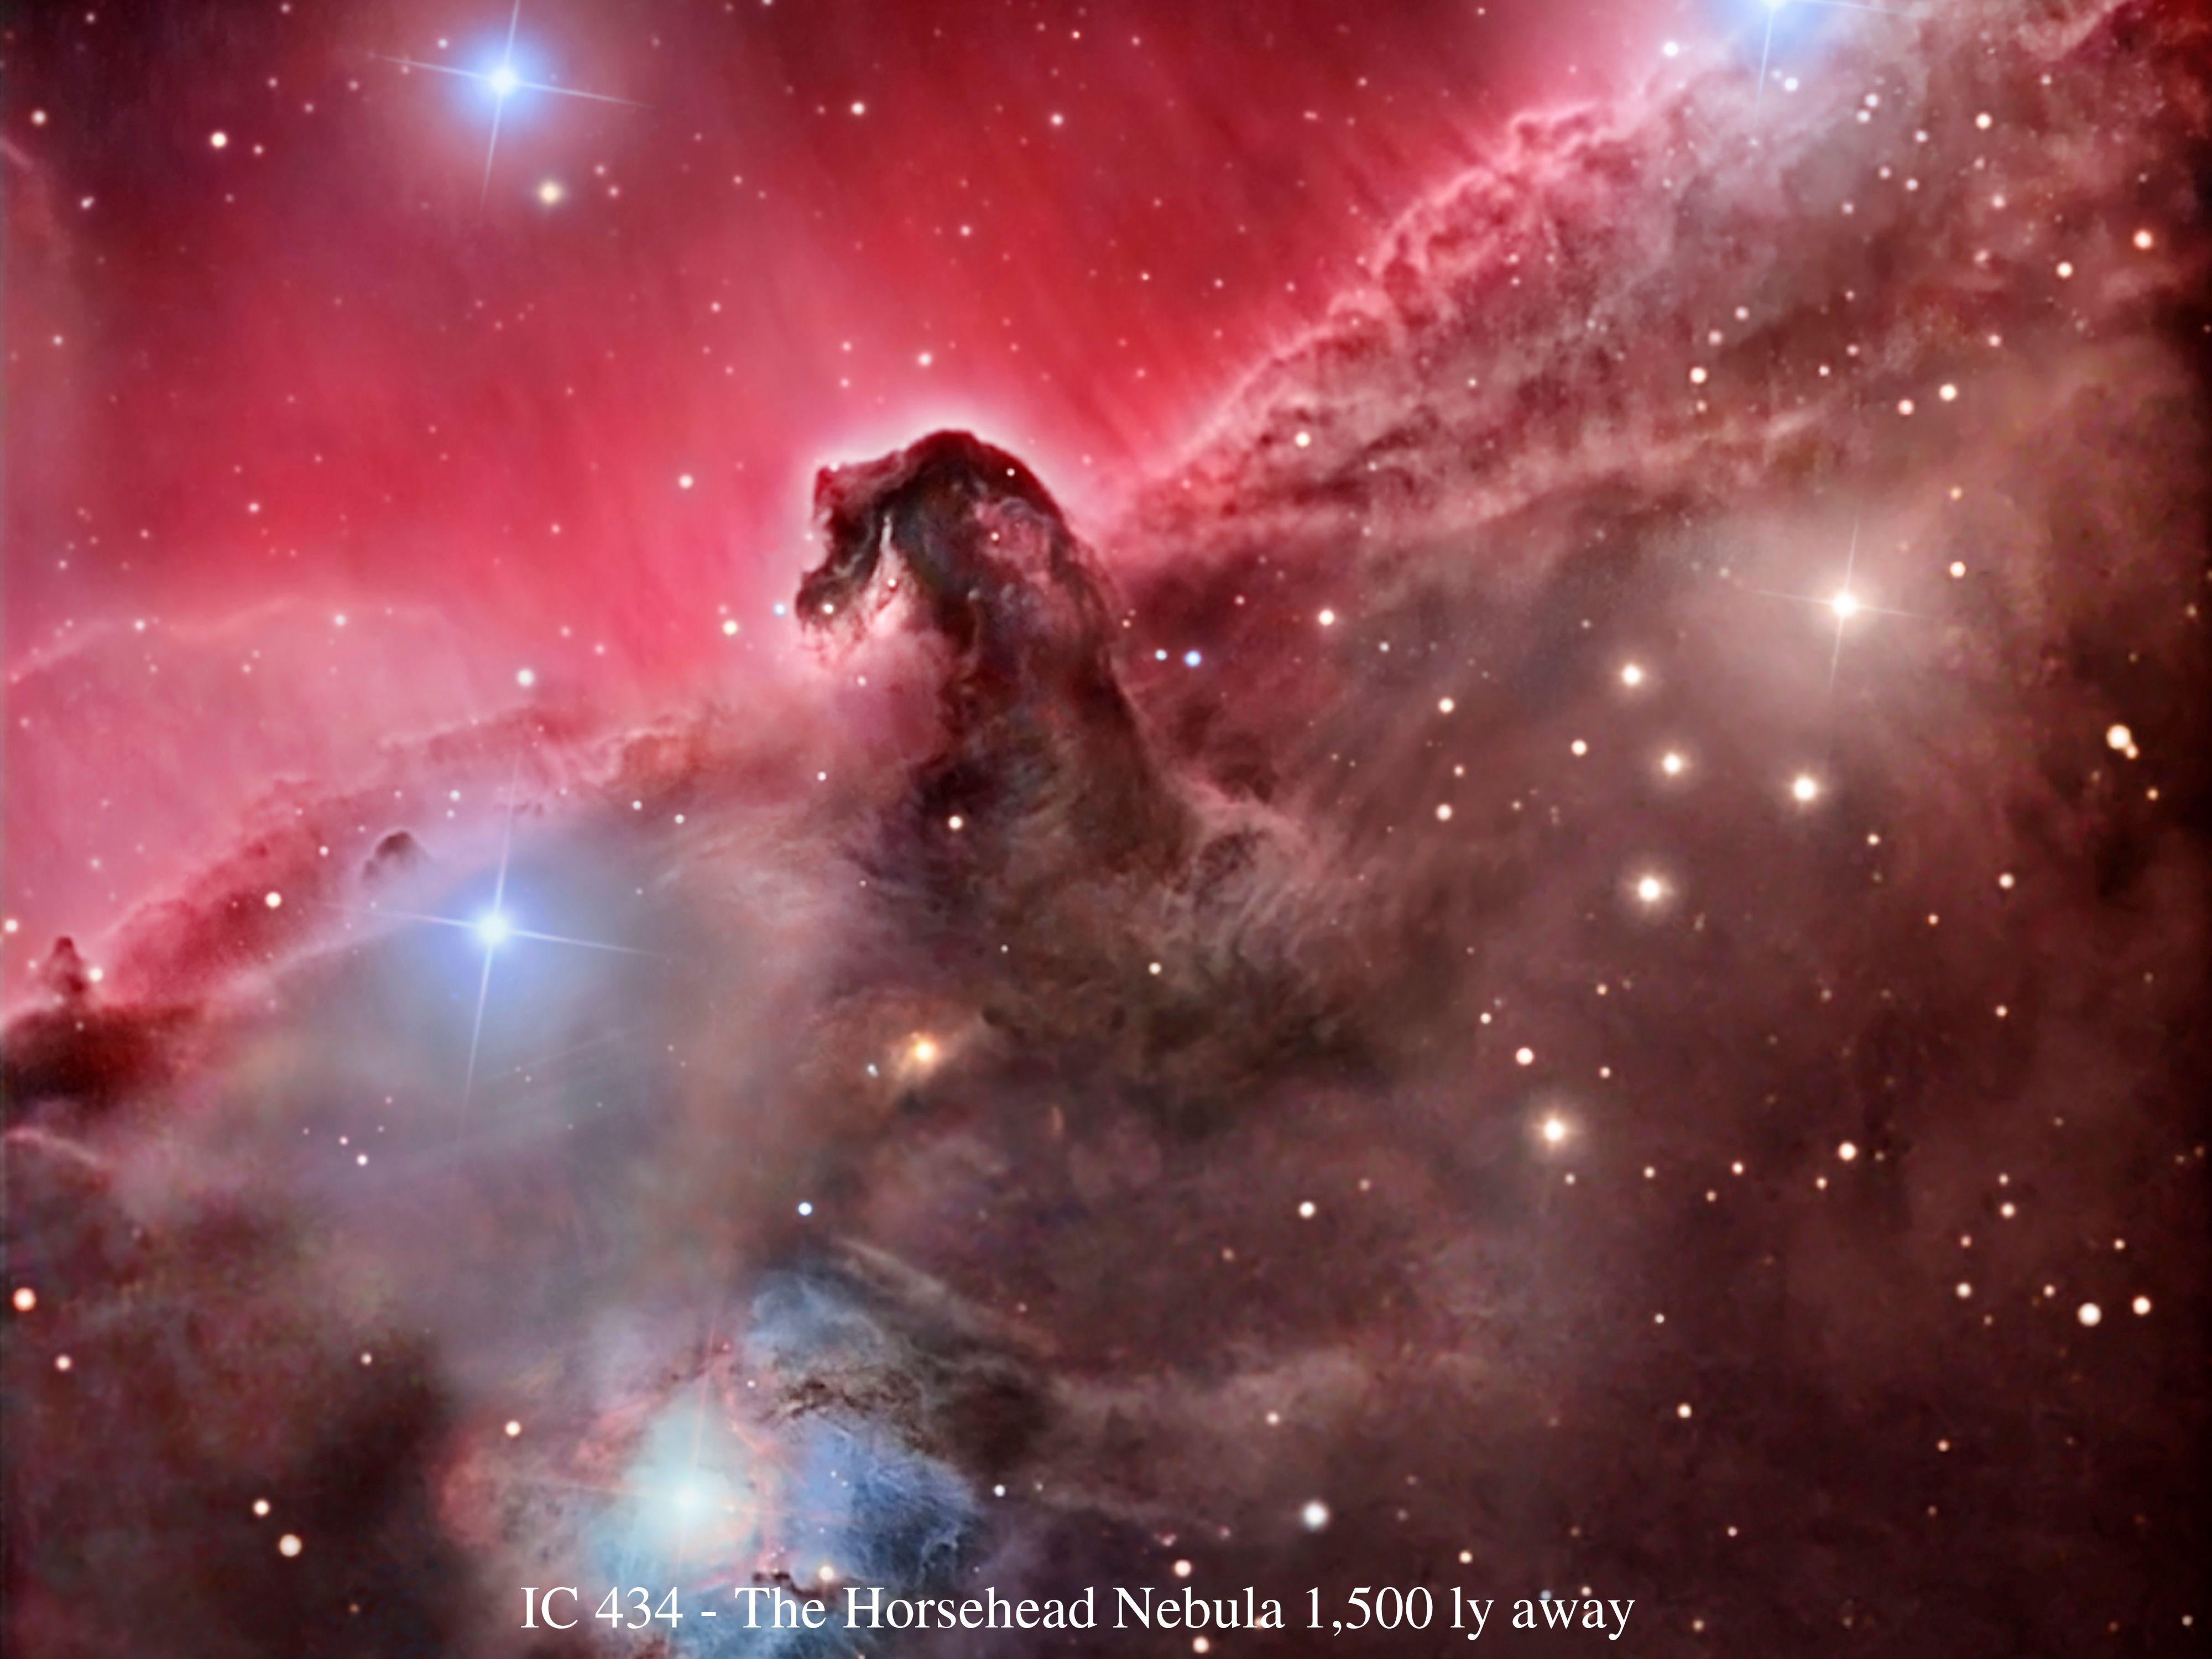 Download Wallpaper Horse Nebula - 975e4233fd9c790b76922666c51bcc55  Perfect Image Reference_7937.jpg